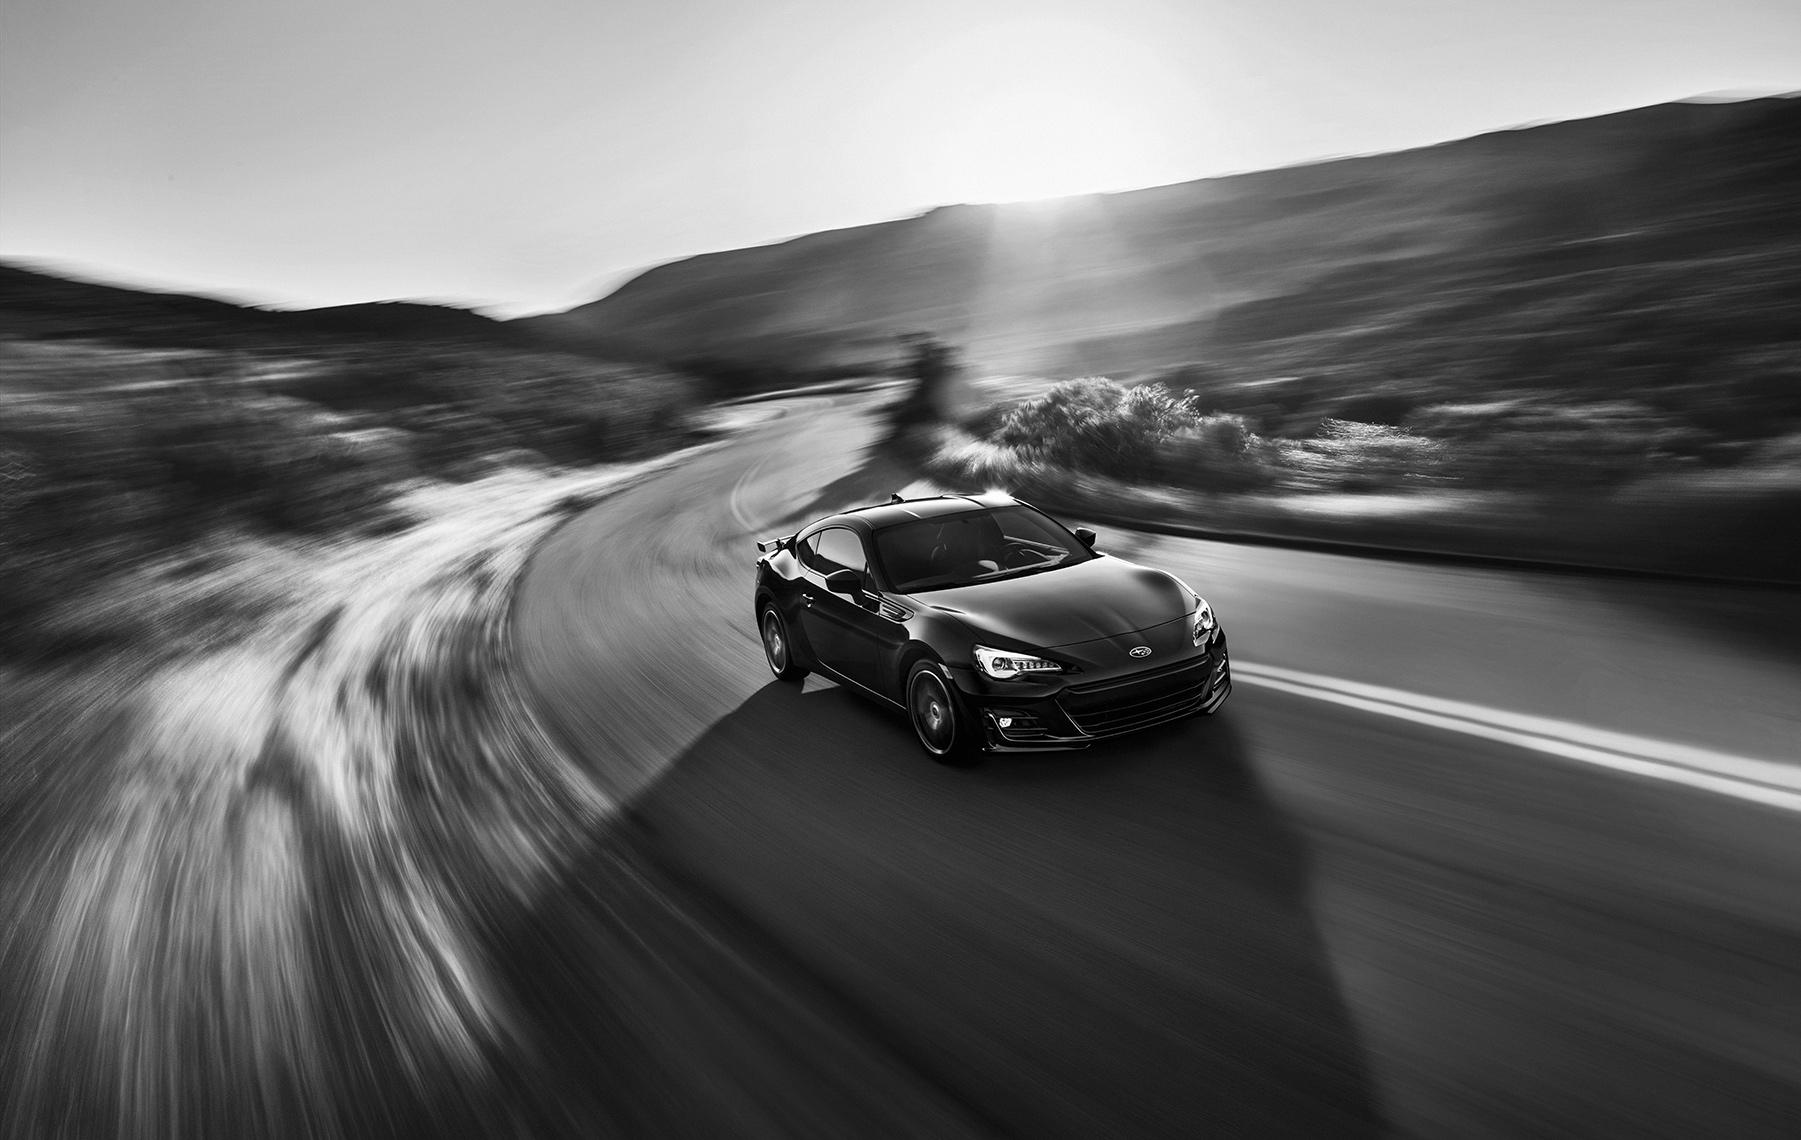 Tyler_Gourley_Photography_Automotive_245.jpg